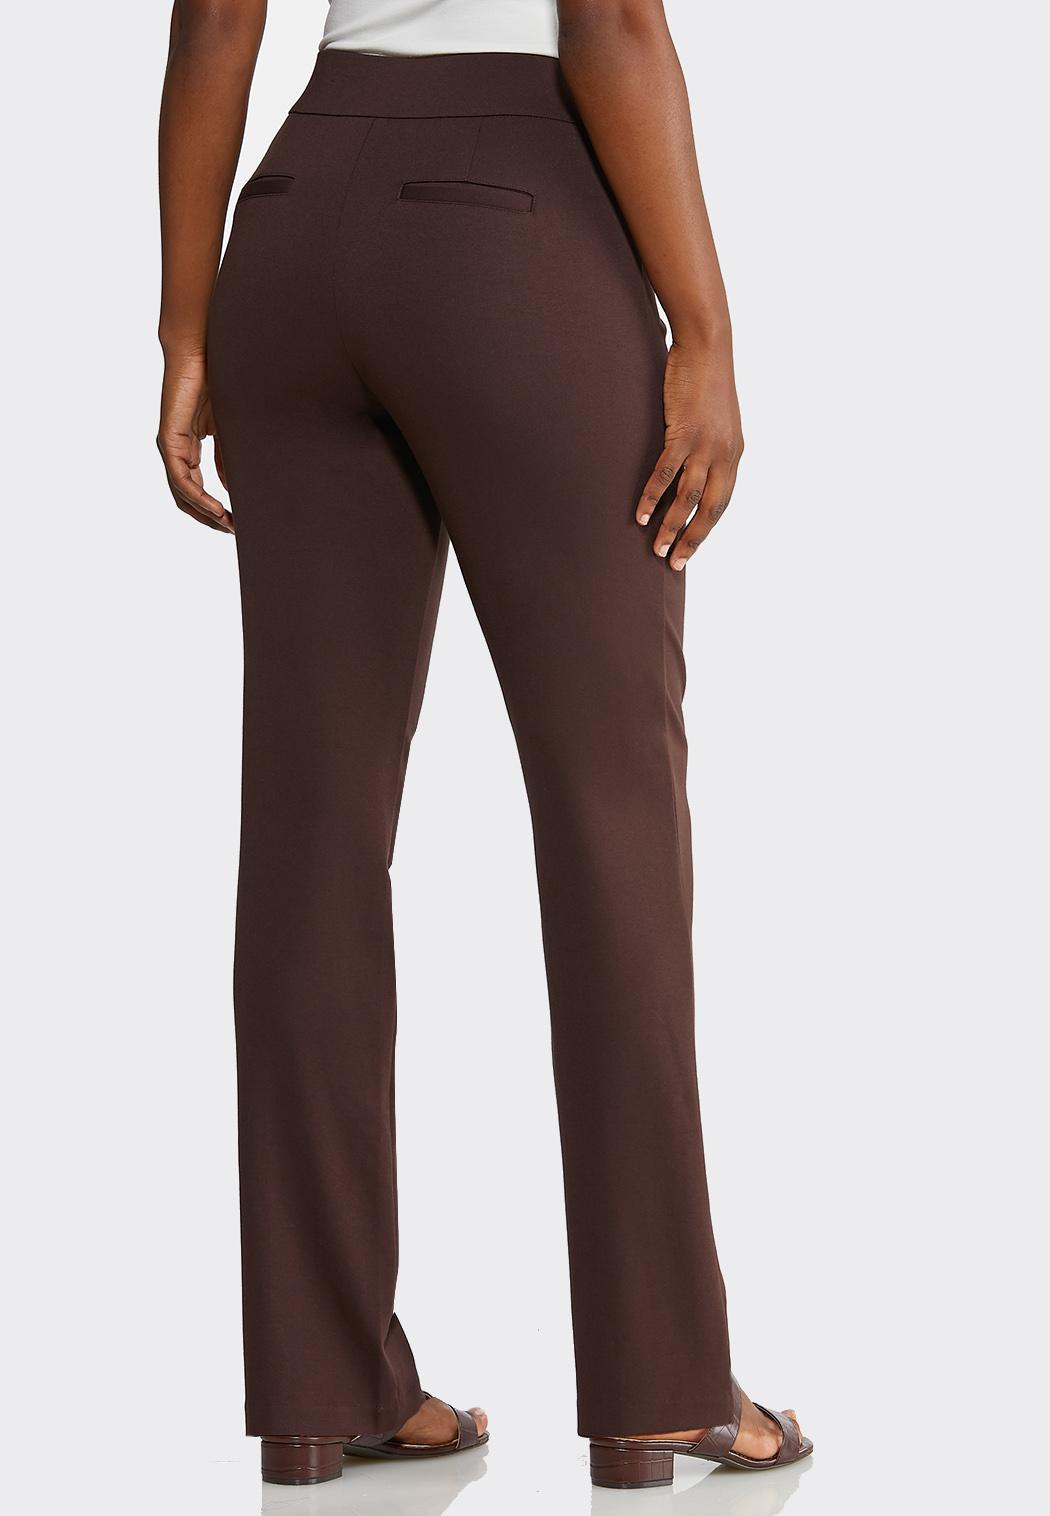 Petite Pintuck Straight Leg Ponte Pants (Item #43918763)